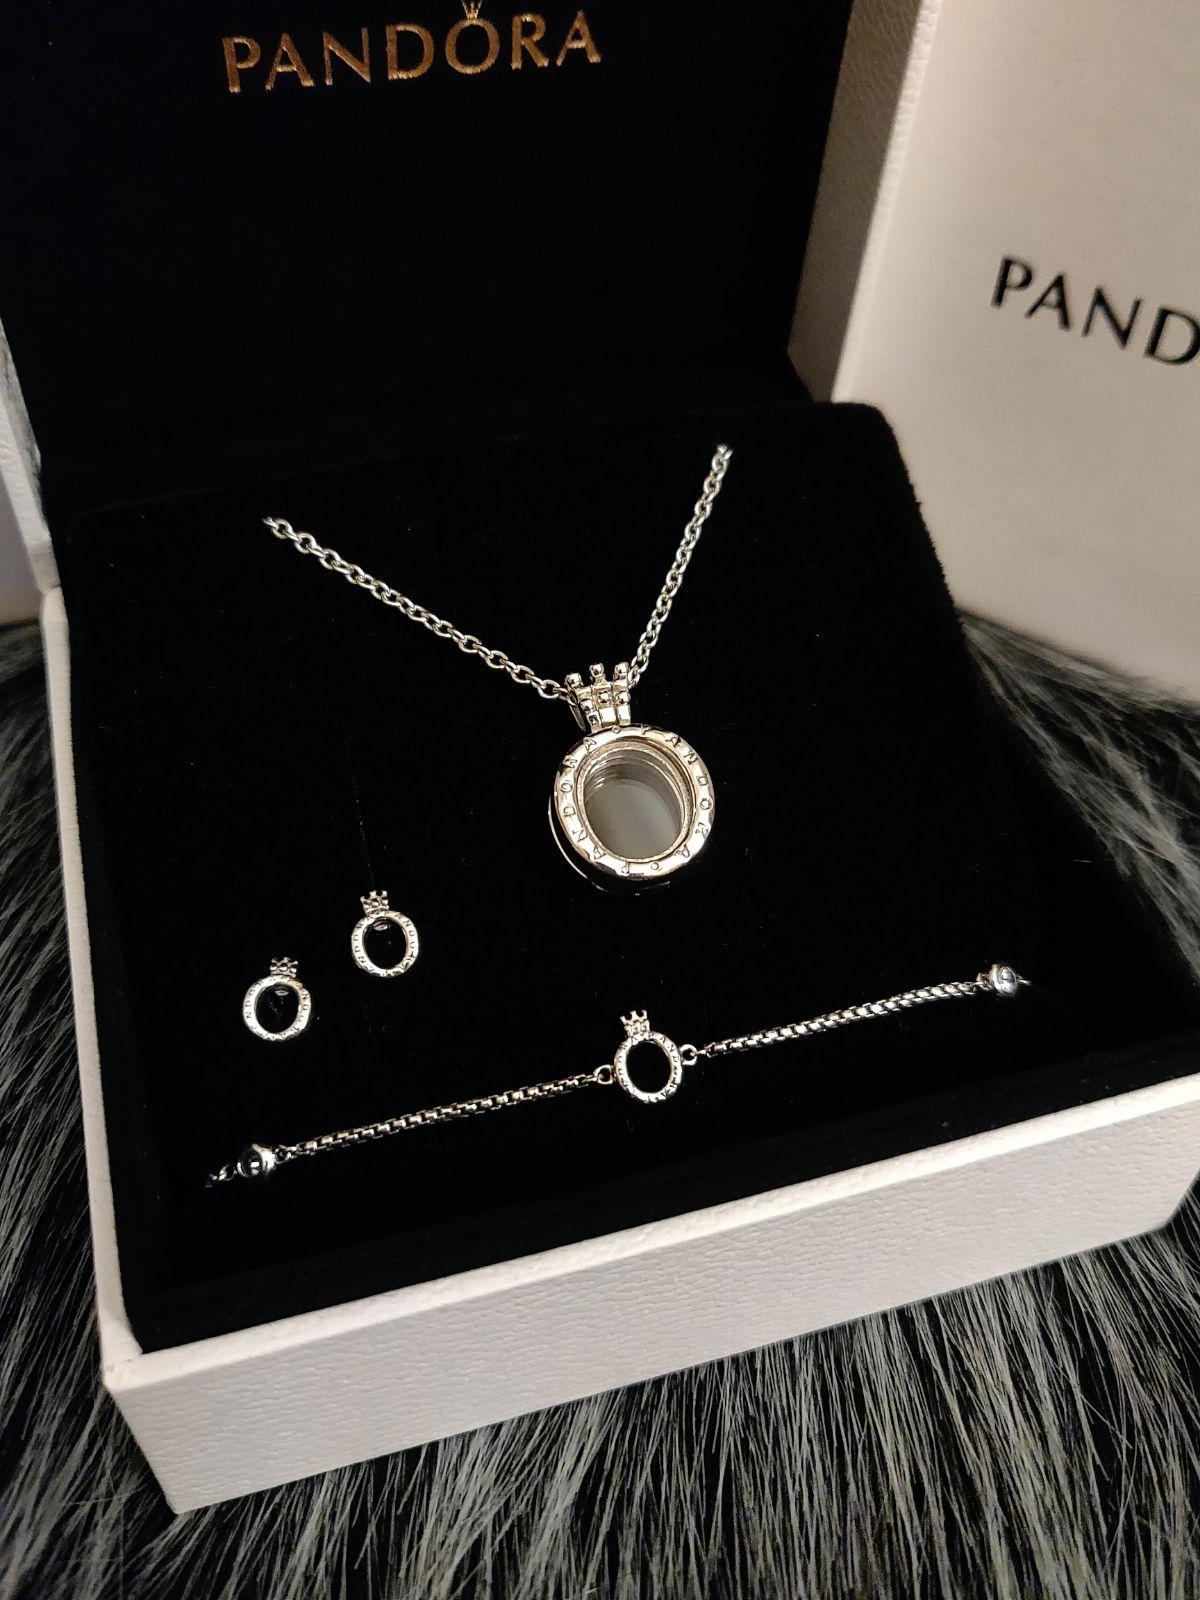 Pandora Crown O Necklace,Earrings & Brac in 2021 | Pandora ...